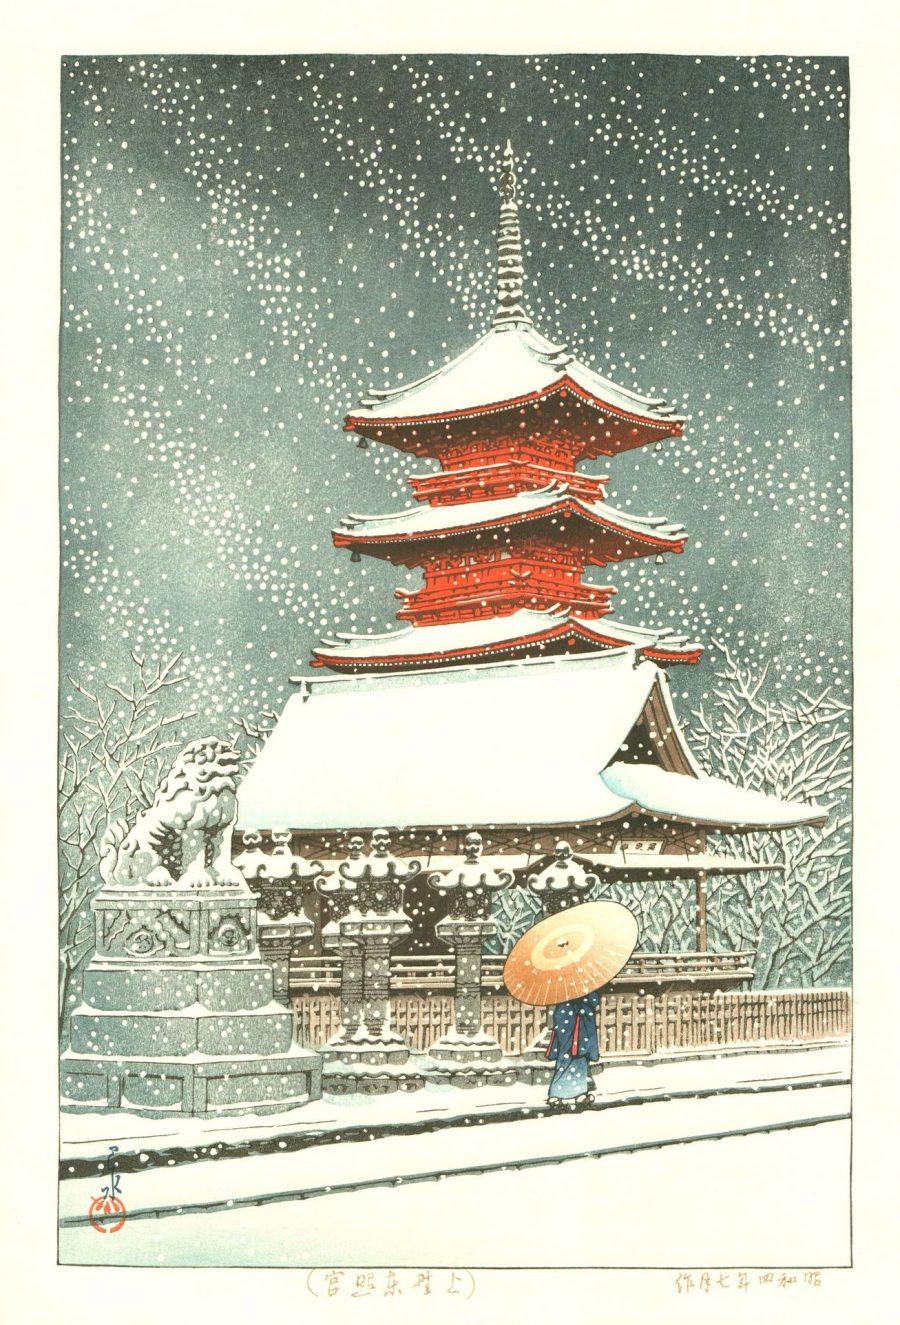 Hasui KAWASE 1929 - Neige au sanctuaire de Ueno Toshogu - Editeurs Kawaguchi et Sakai puis Shobisha.